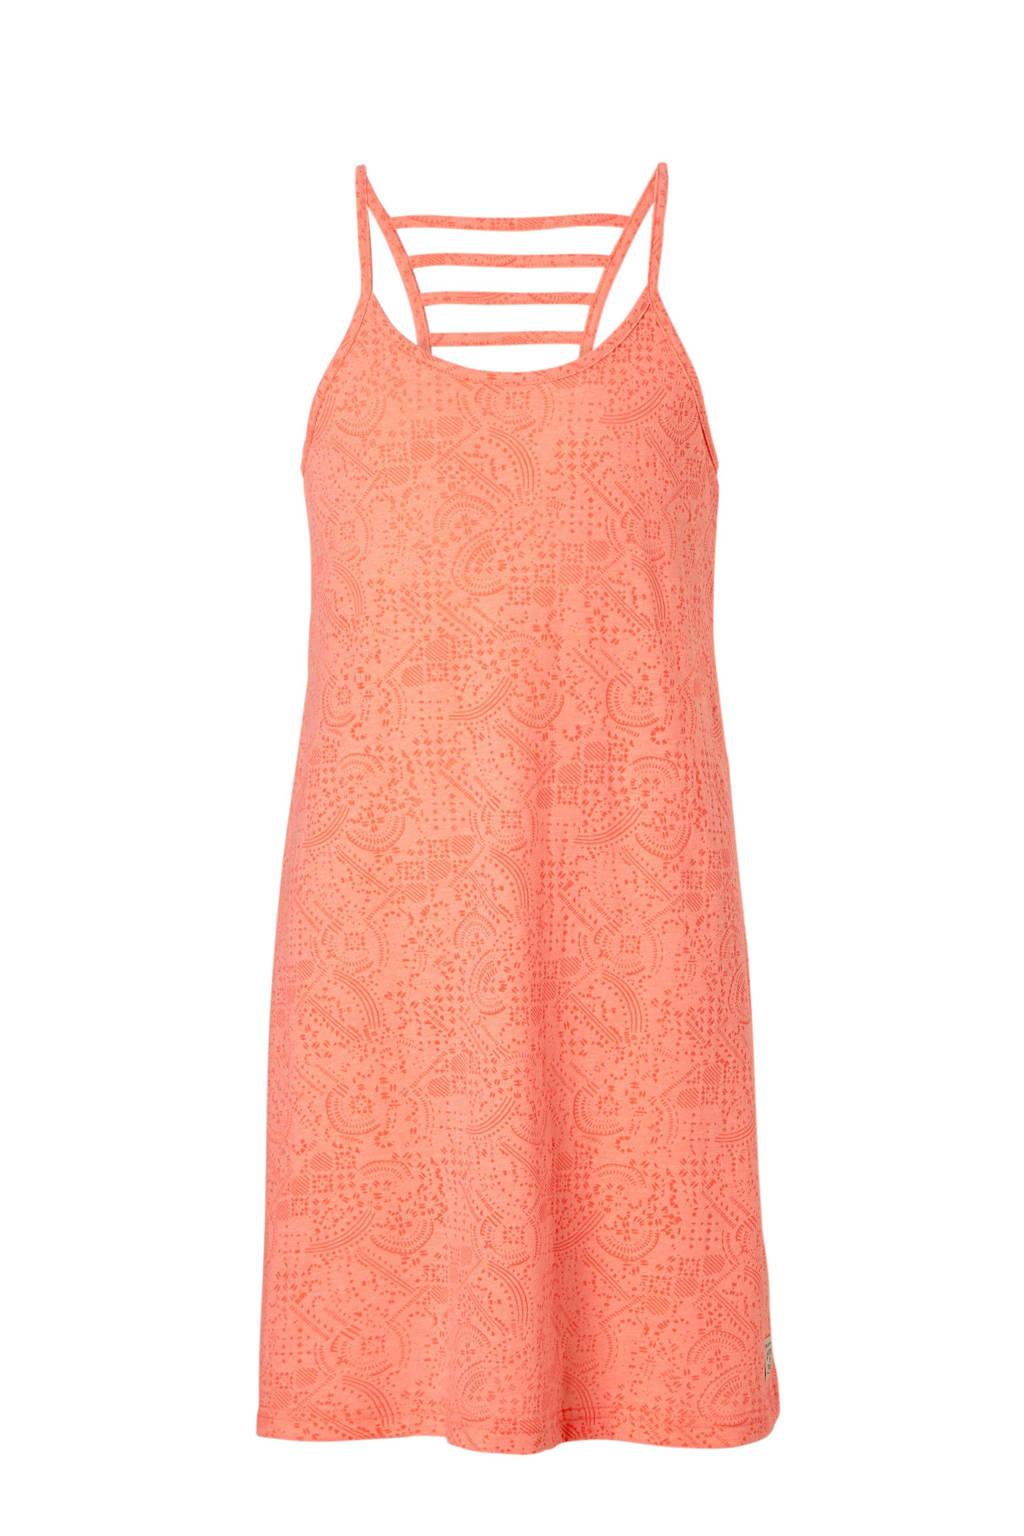 Protest jurk Copper met alloverprint zalm, Zalm